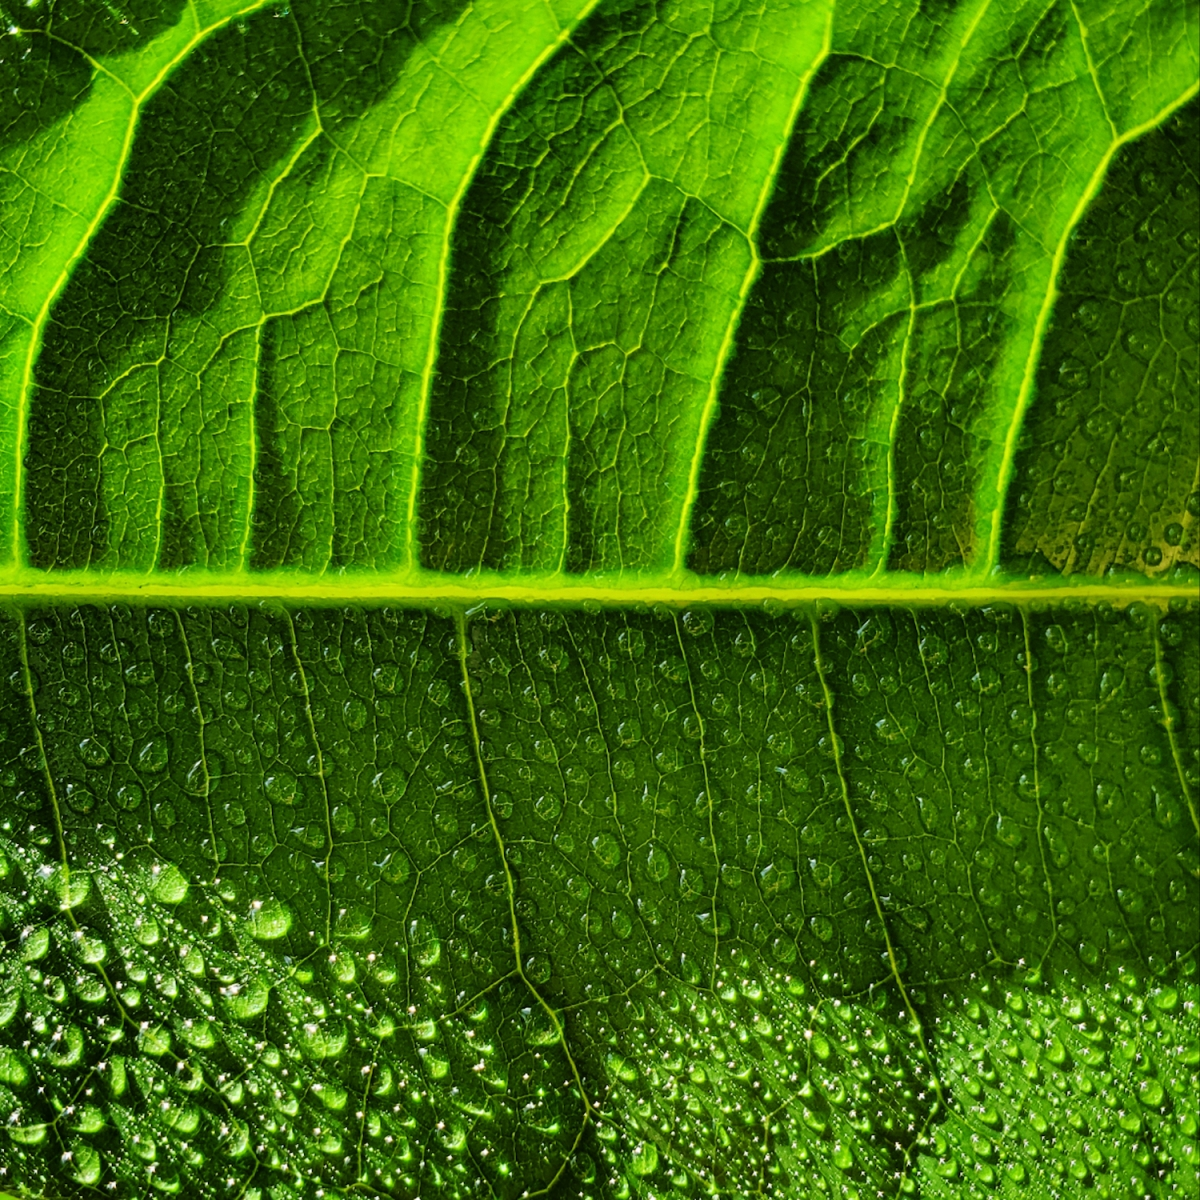 Closeup of a money tree leaf after a light mistingCloseup of a money tree leaf after a light misting